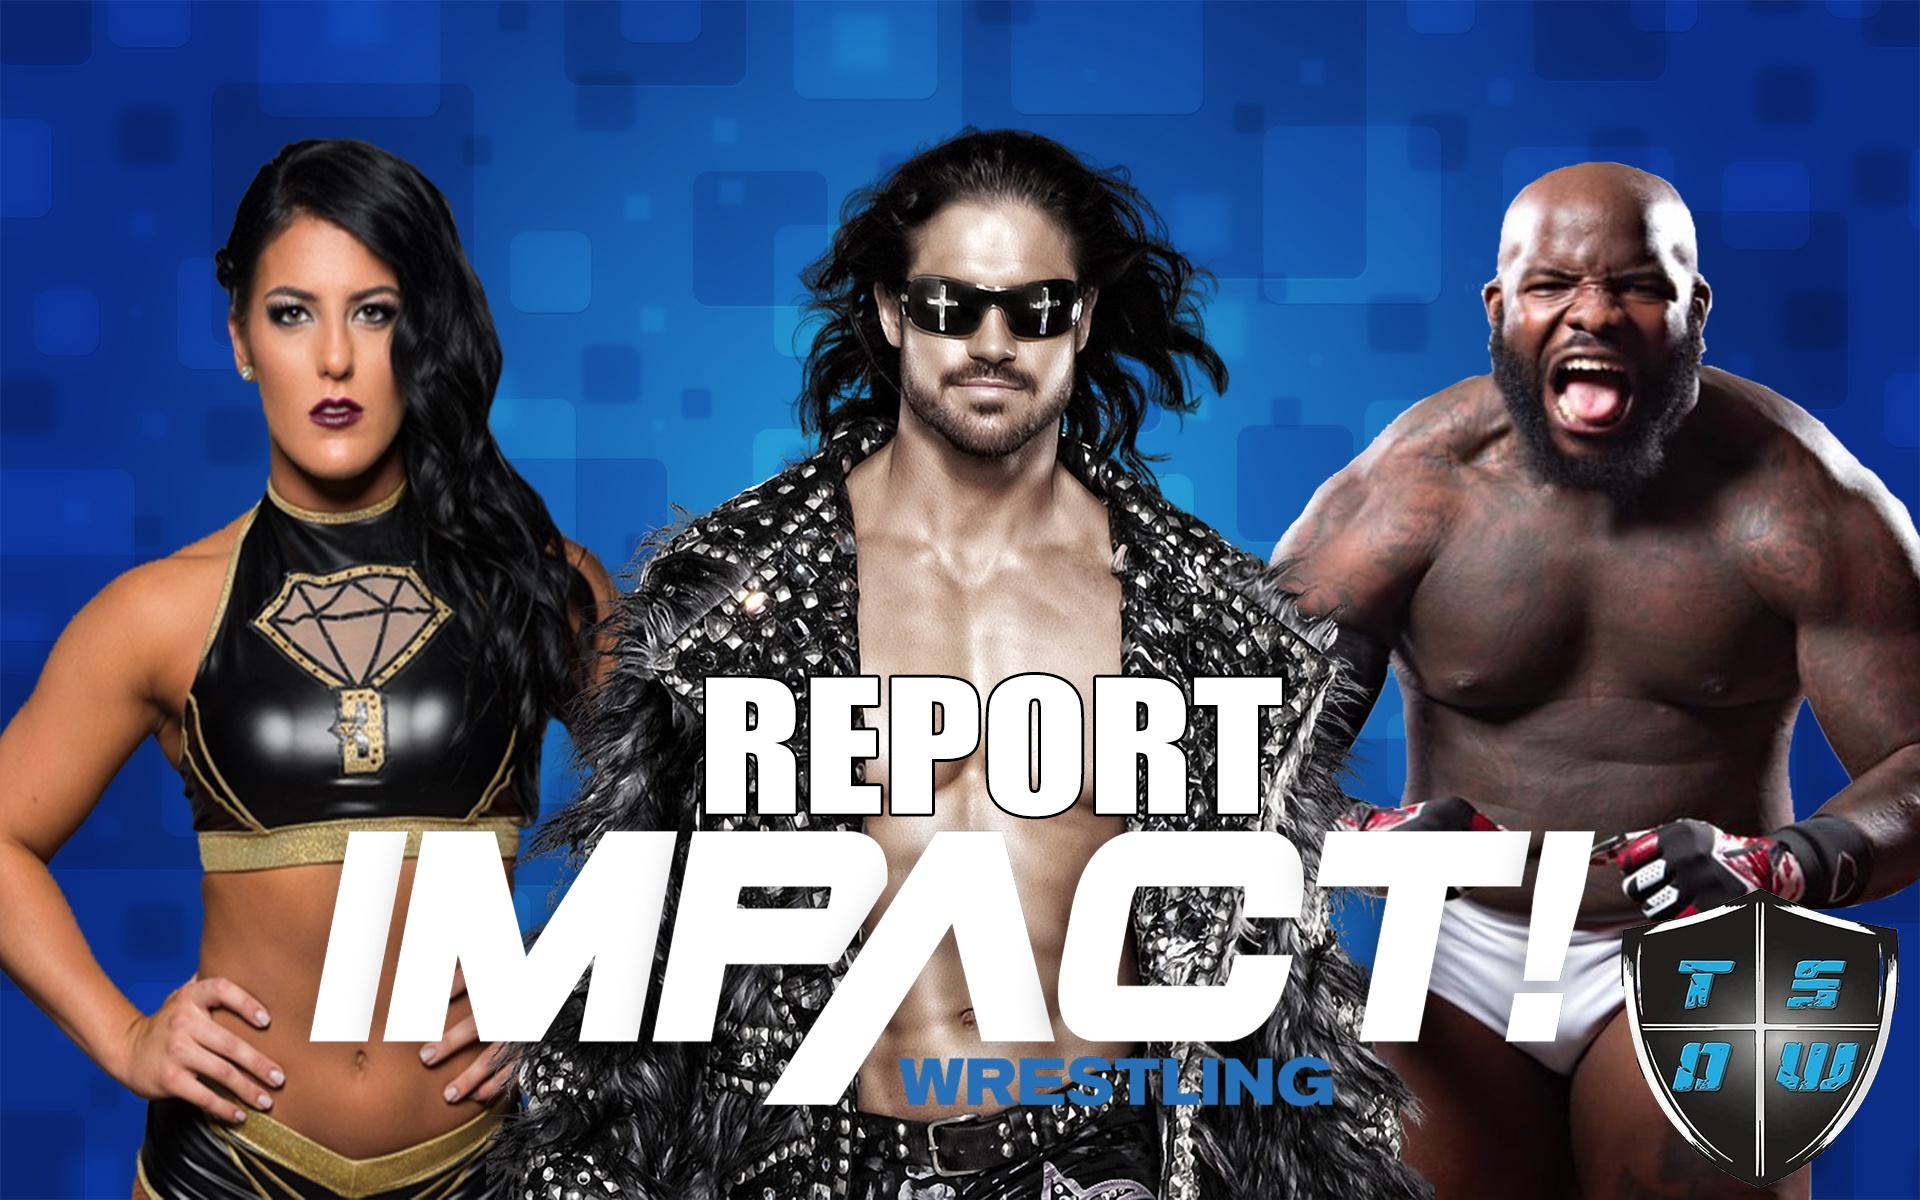 Report Impact!